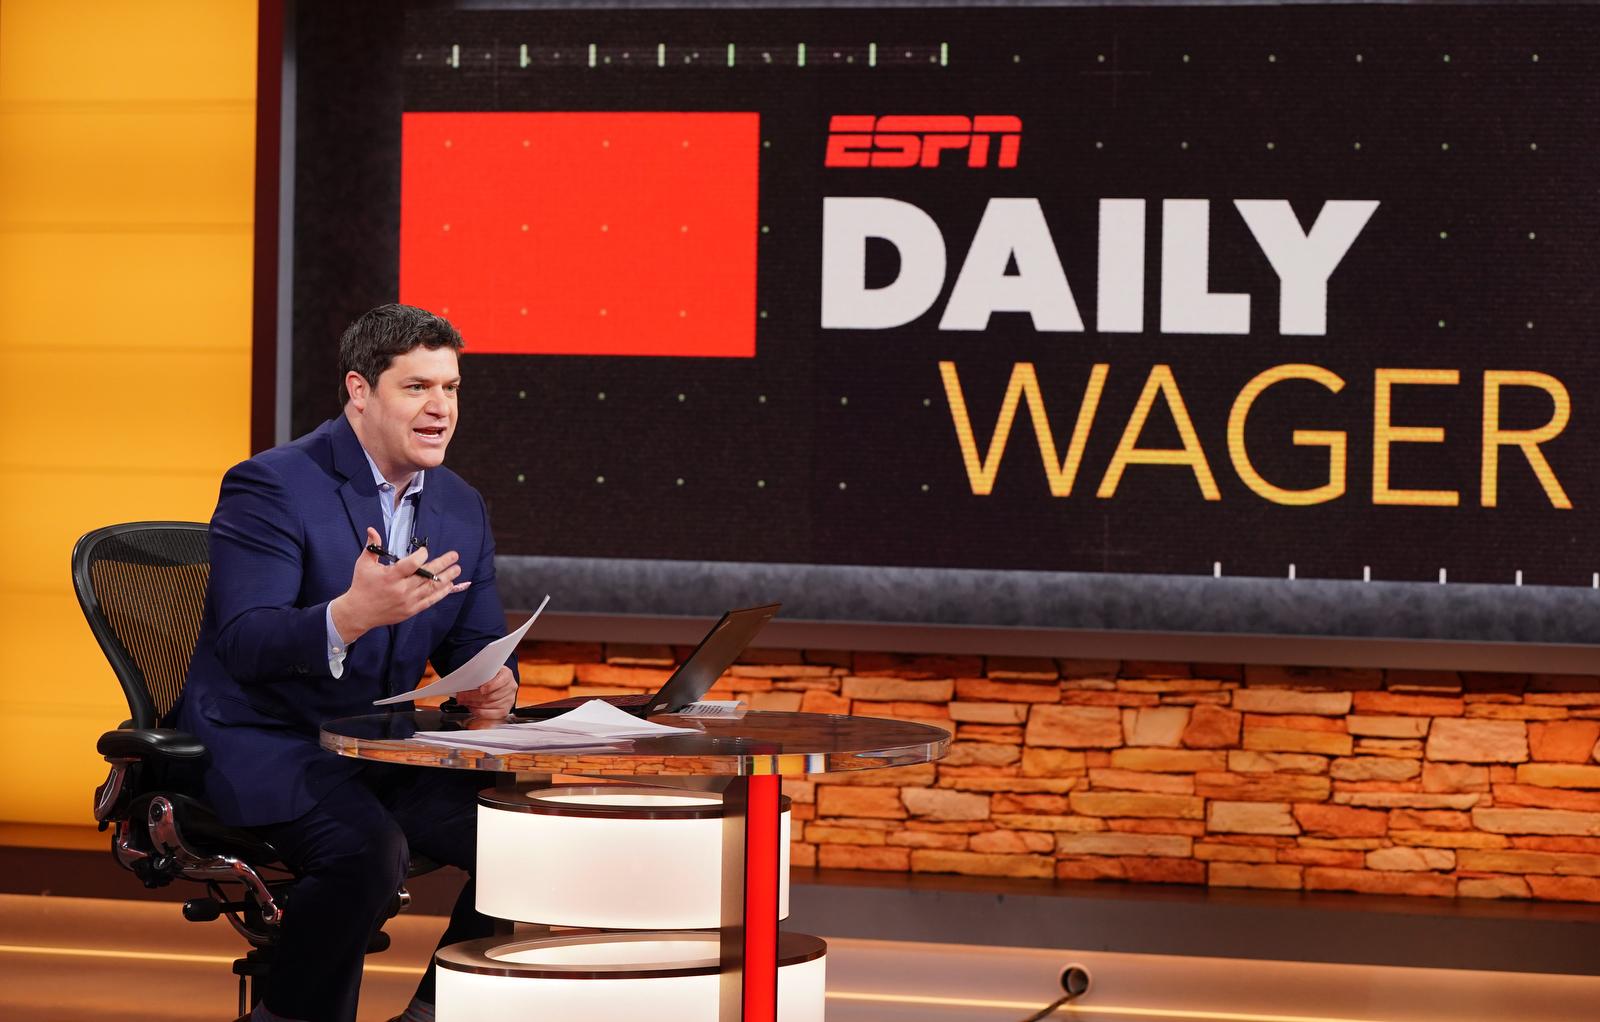 NCS_ESPN-Daily-Wager_Doug-Kezirian_0001